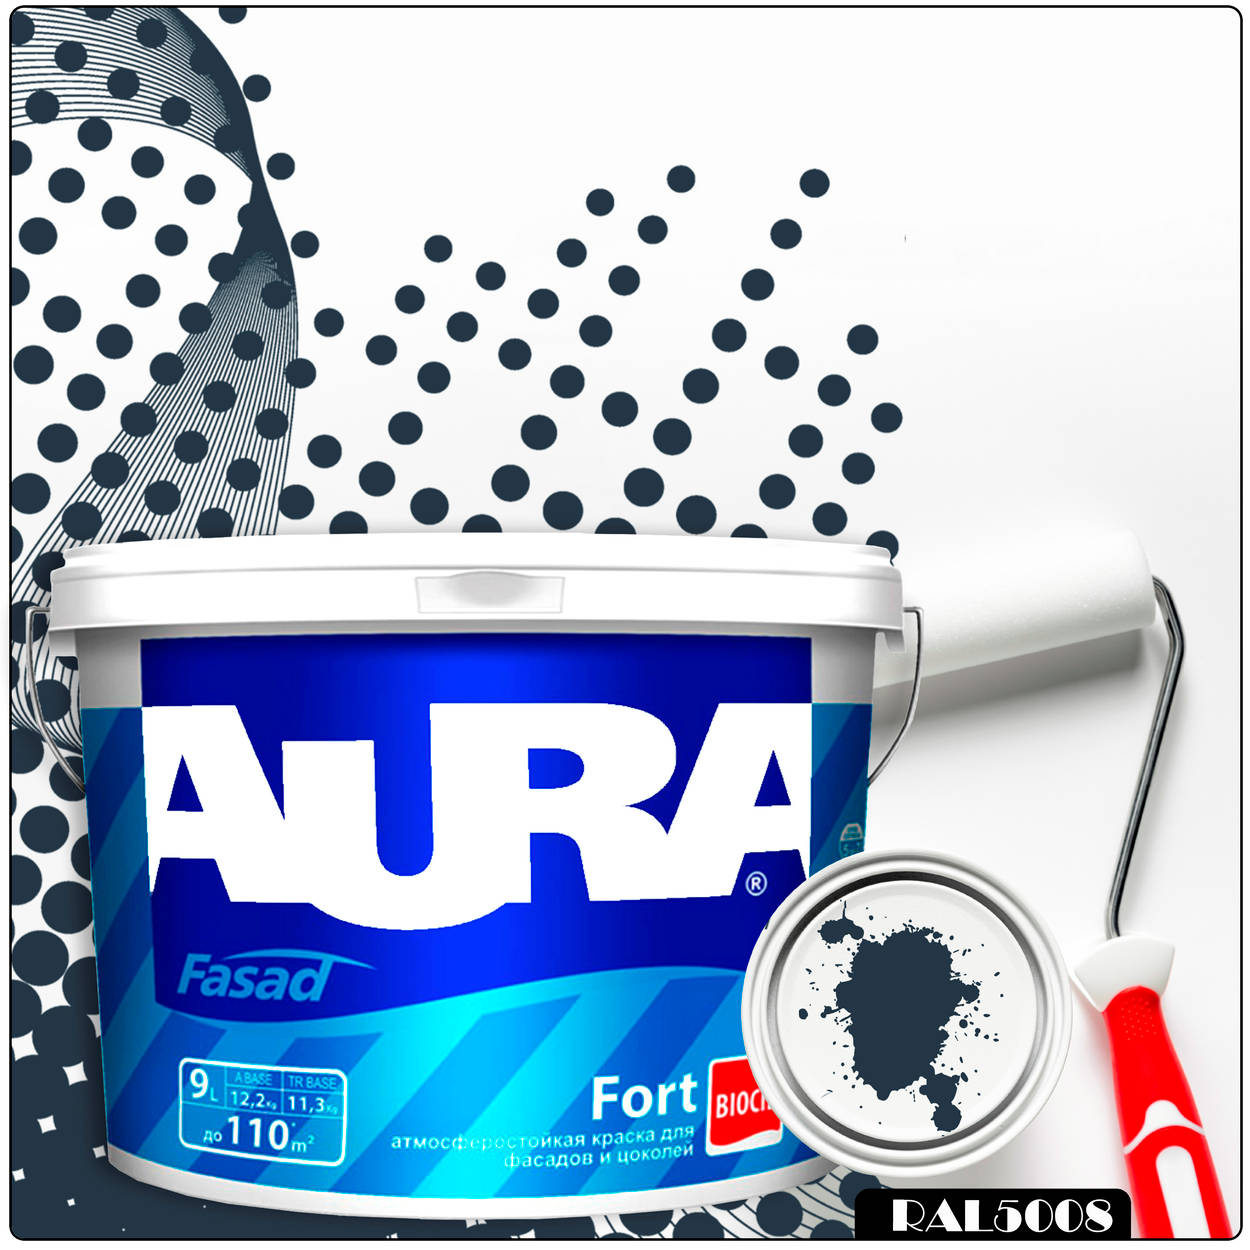 Фото 8 - Краска Aura Fasad Fort, RAL 5008 Серо-синий, латексная, матовая, для фасада и цоколей, 9л, Аура.